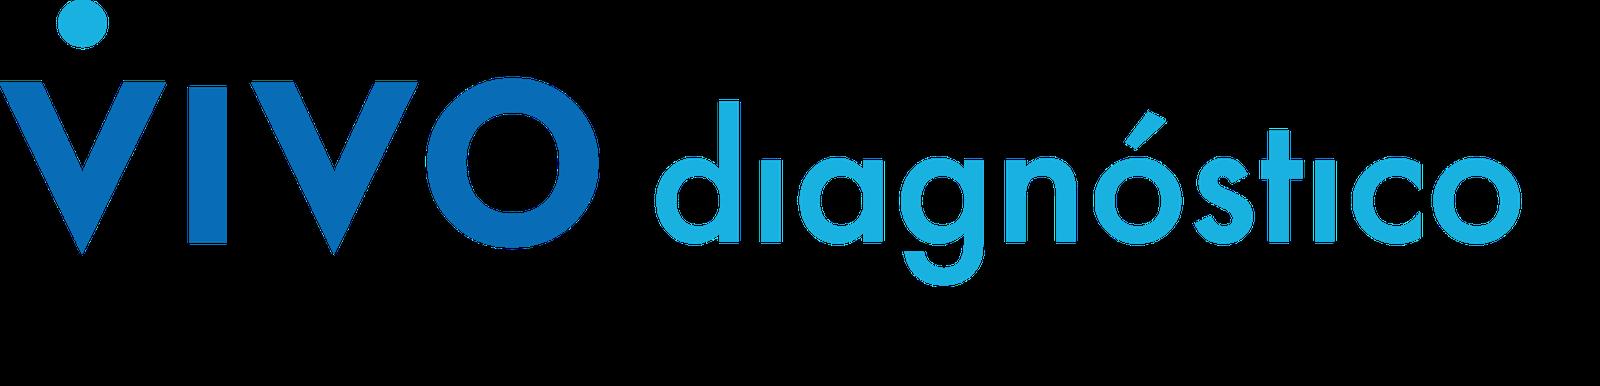 grupo vivo diagnóstico